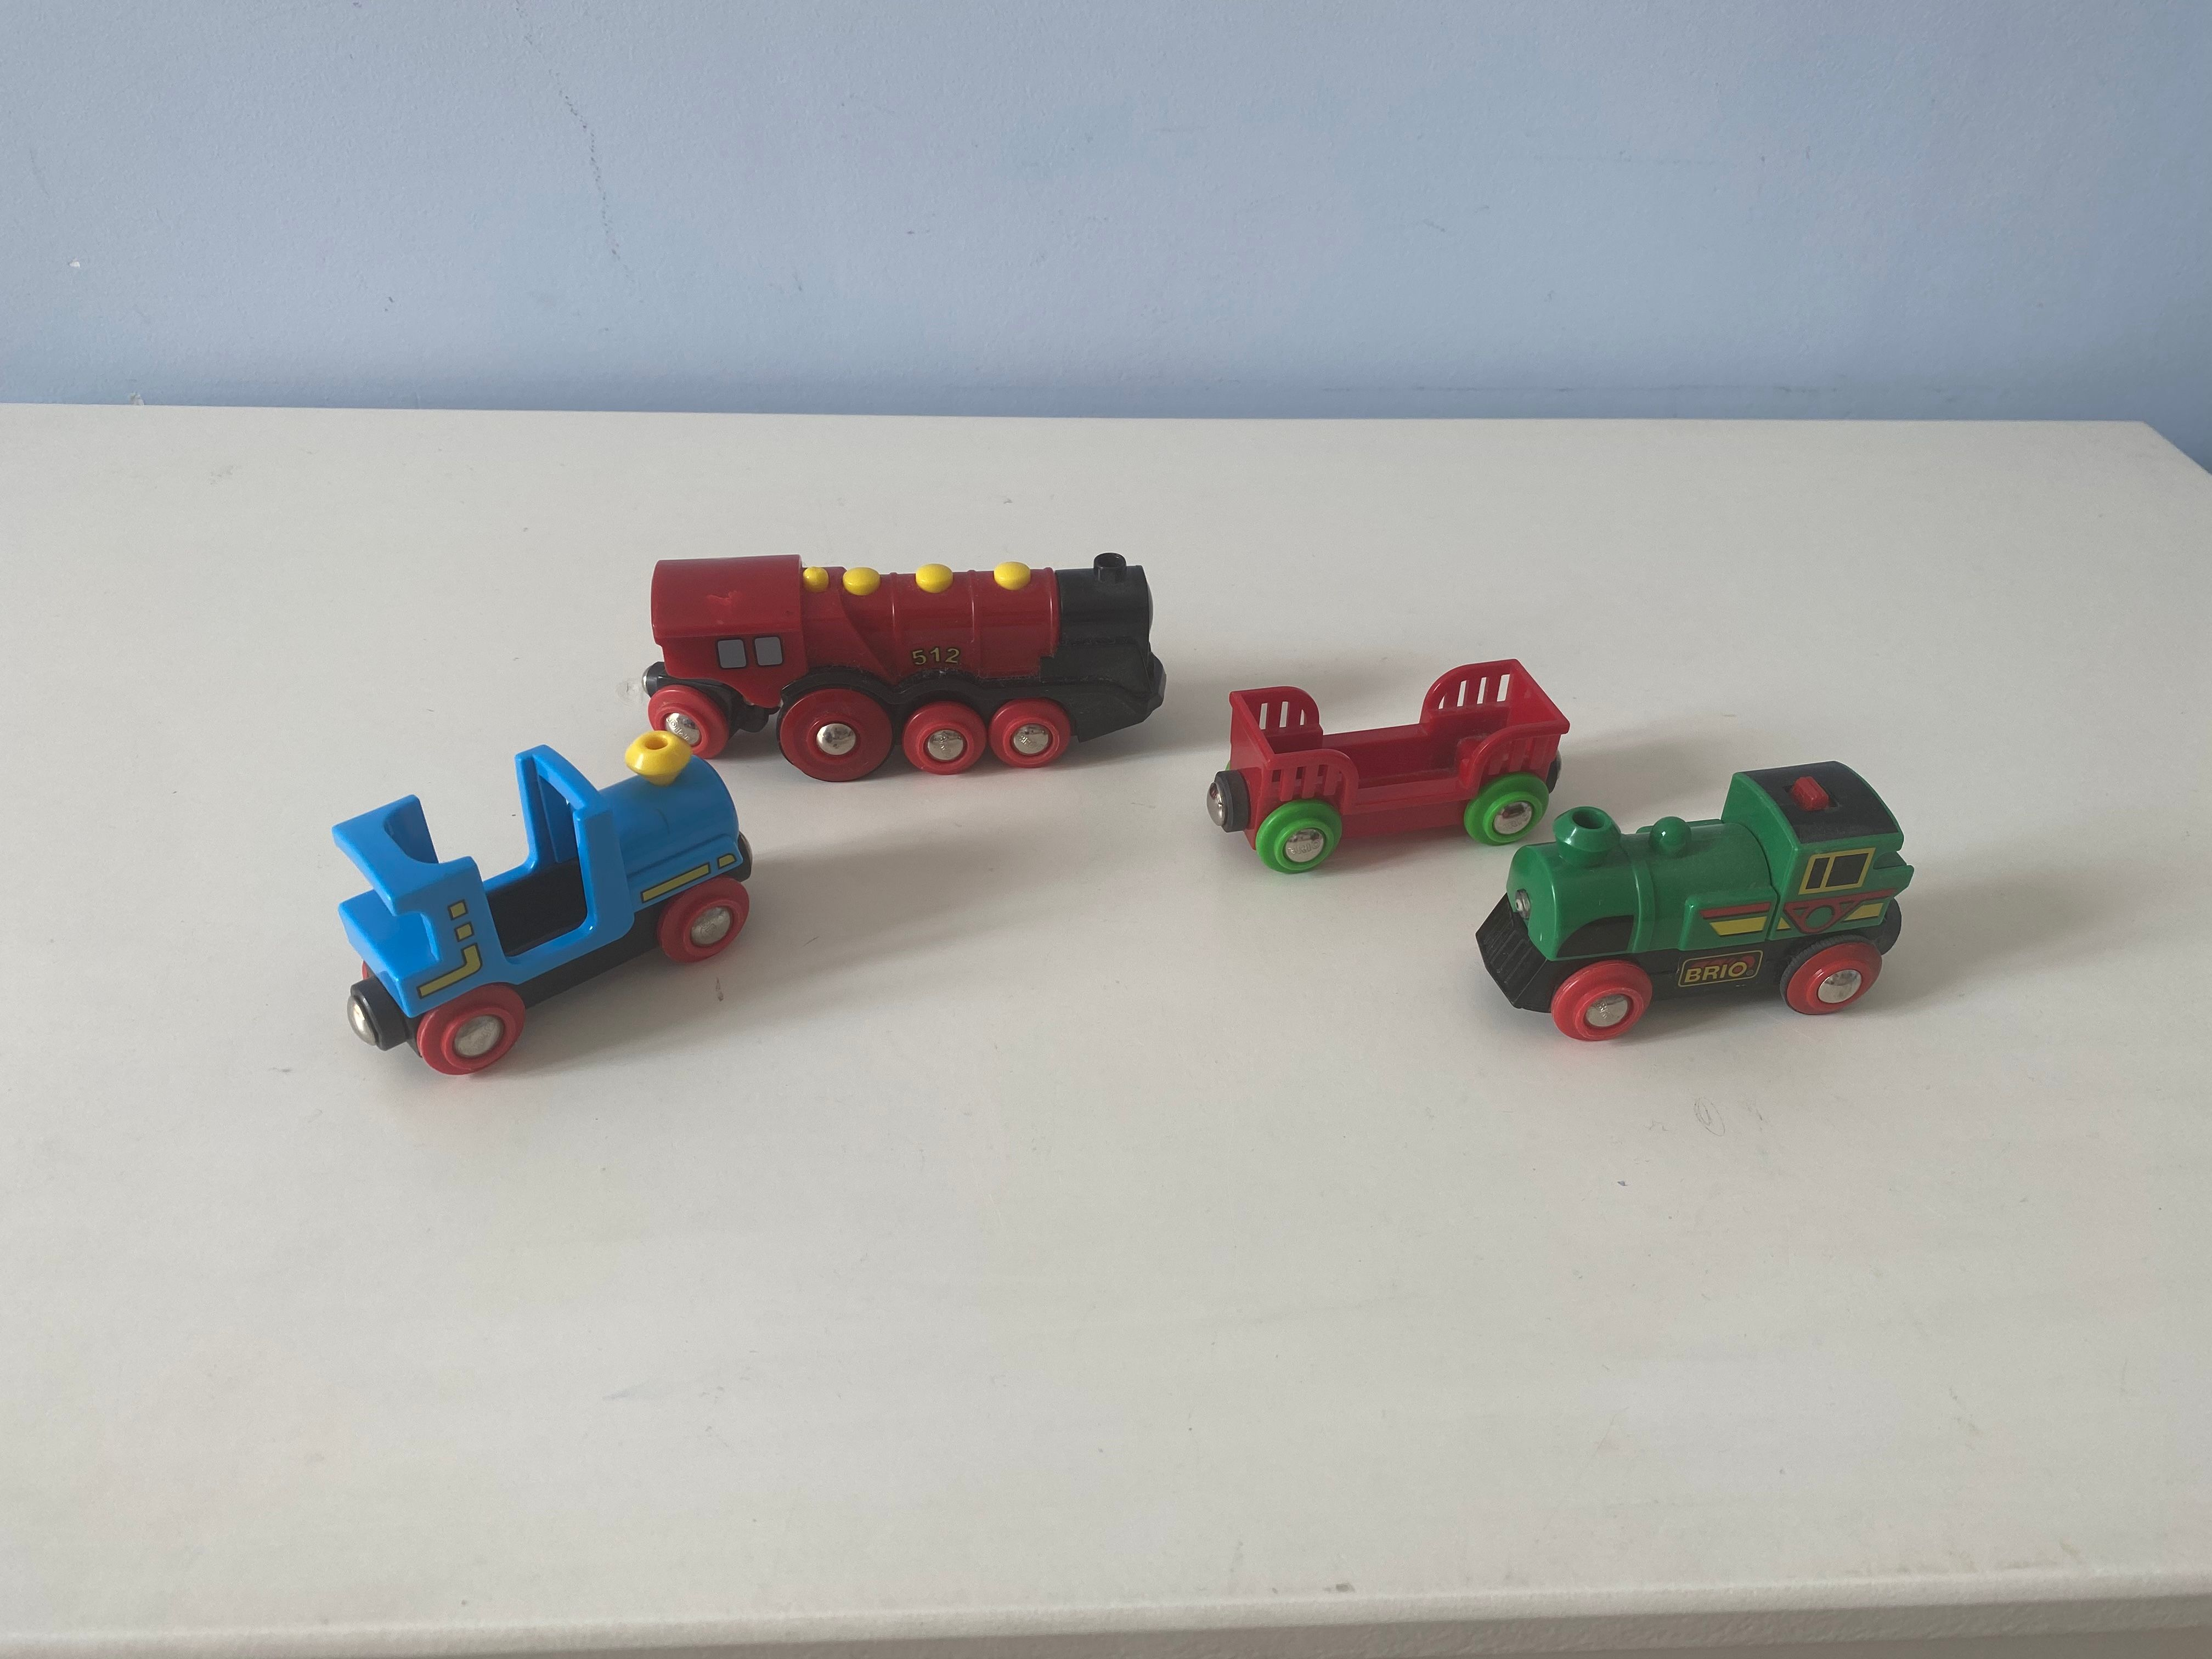 Ensemble rails, gare et locomotives Brio